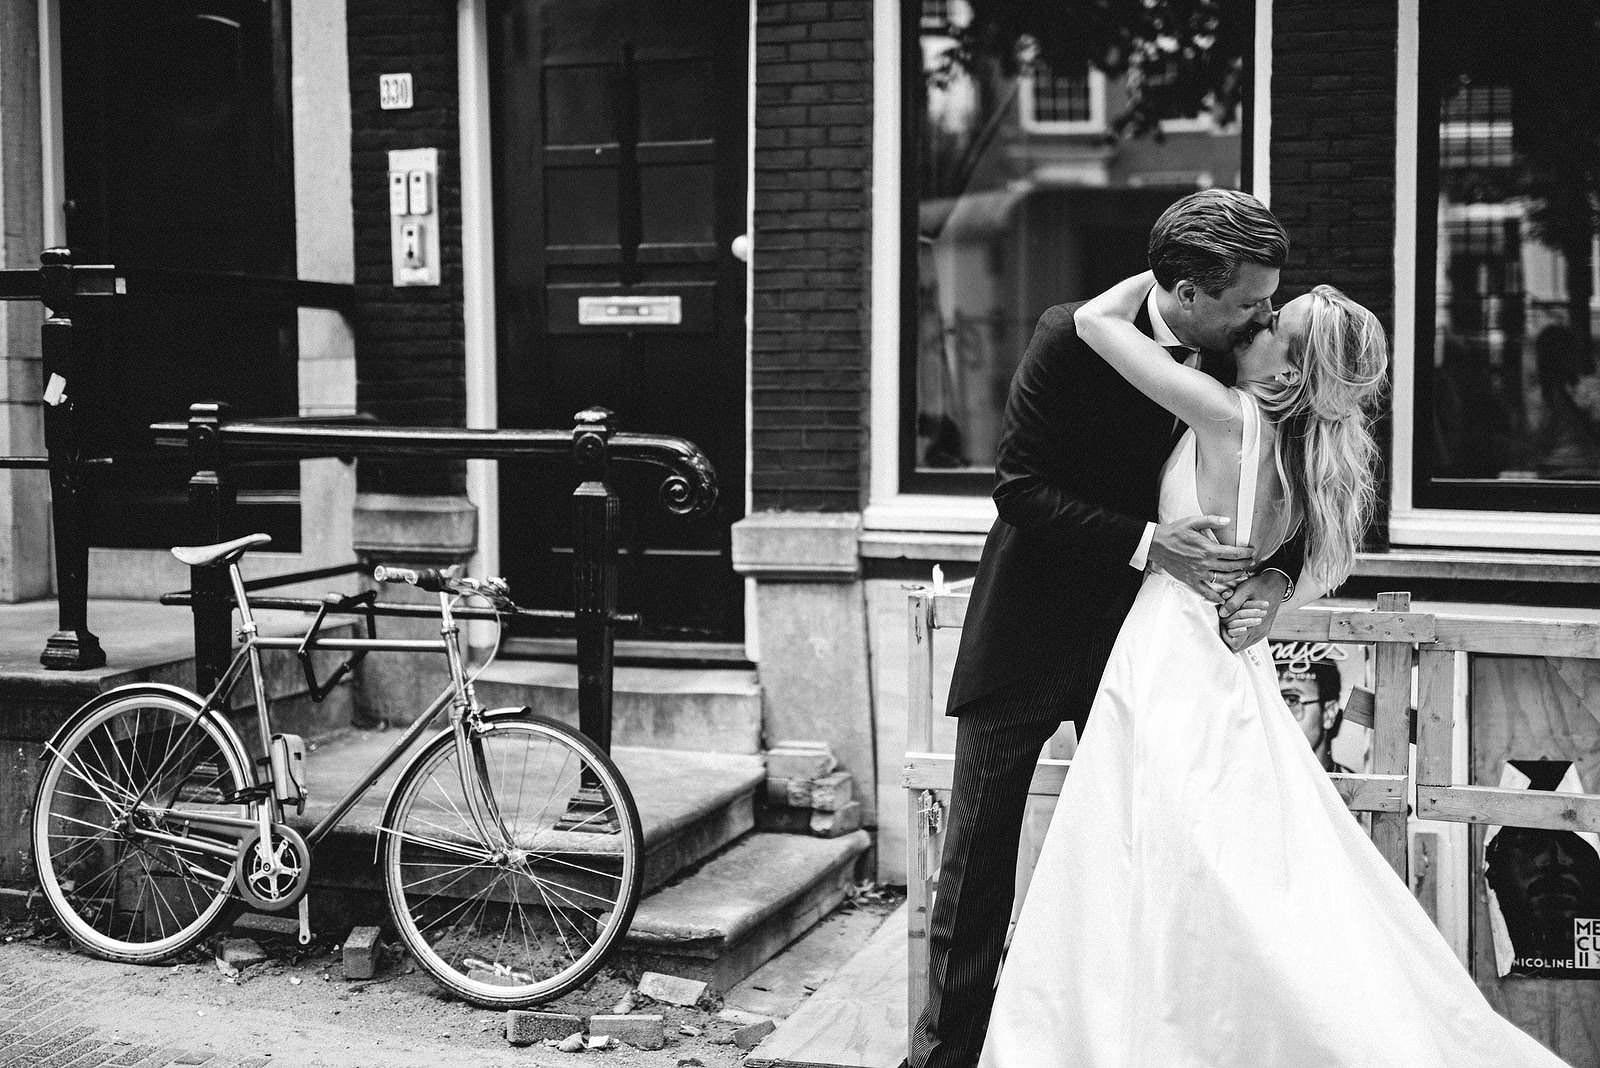 Fotograf Konstanz - Destination Wedding Photographer Amsterdam 087 - Destination Wedding Amsterdam  - 192 -